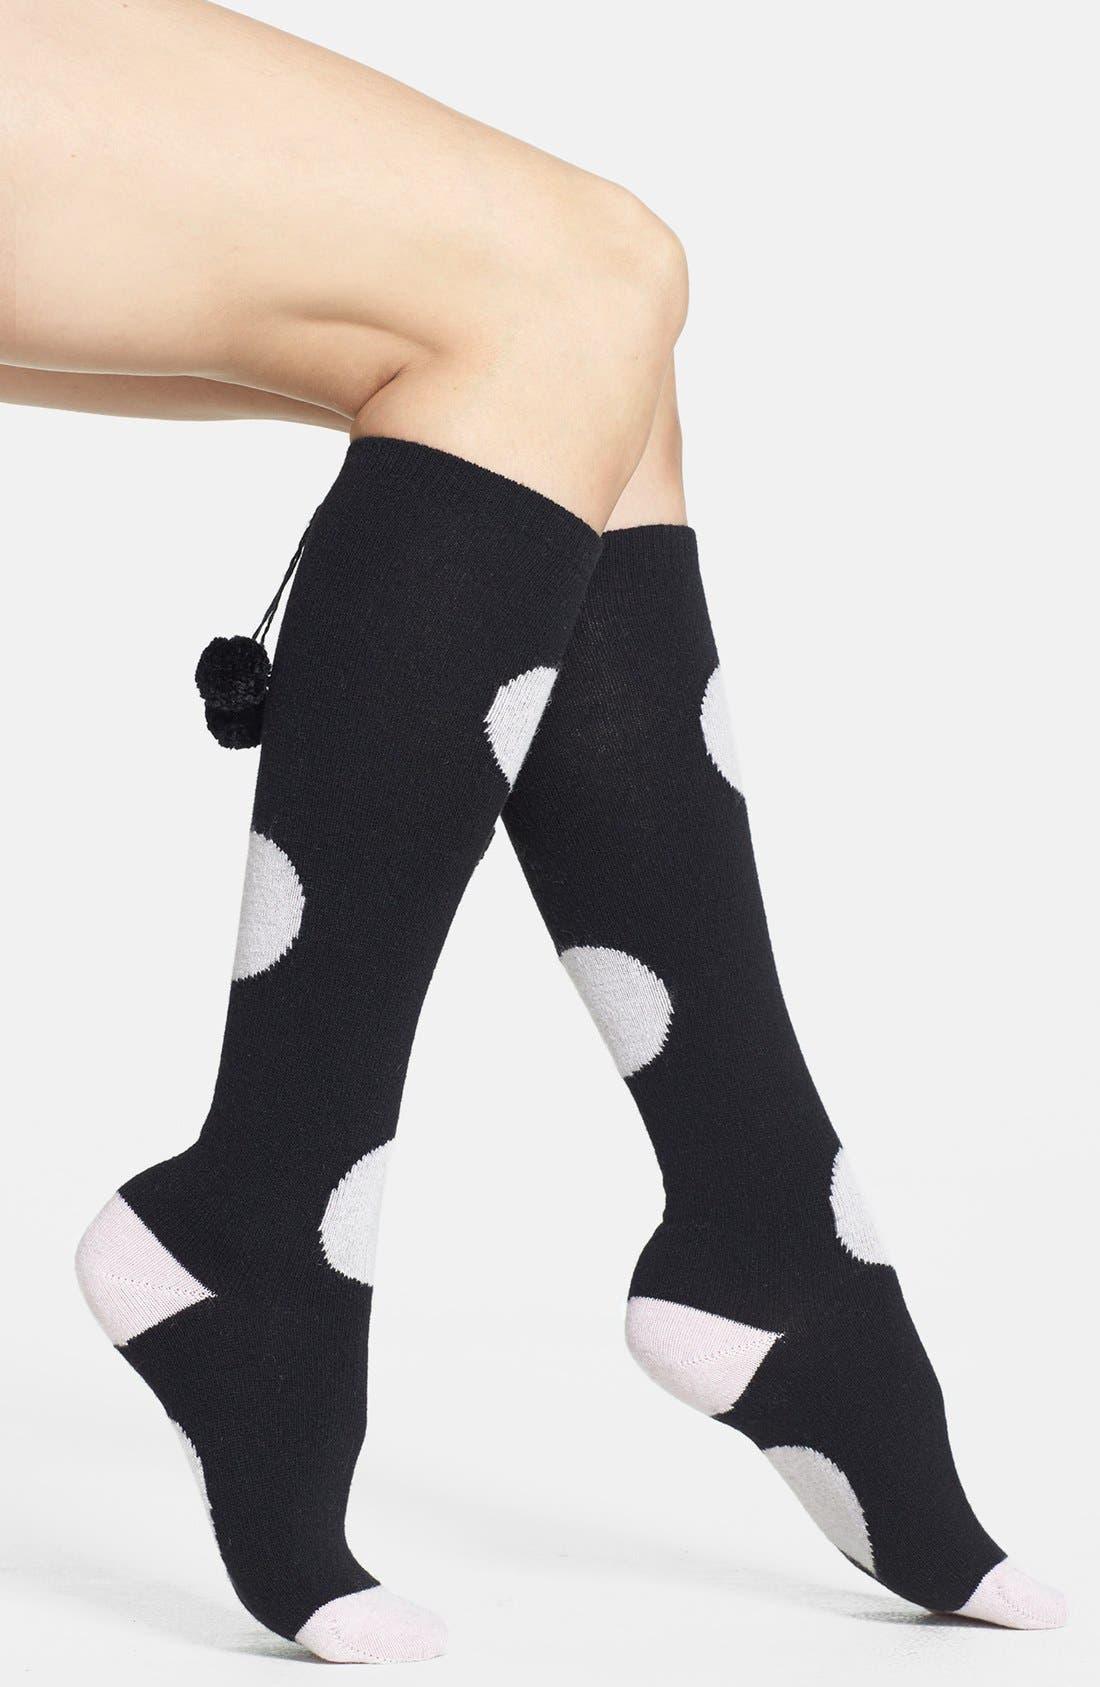 Main Image - kate spade new york 'holiday - big spot' pompom knee high socks